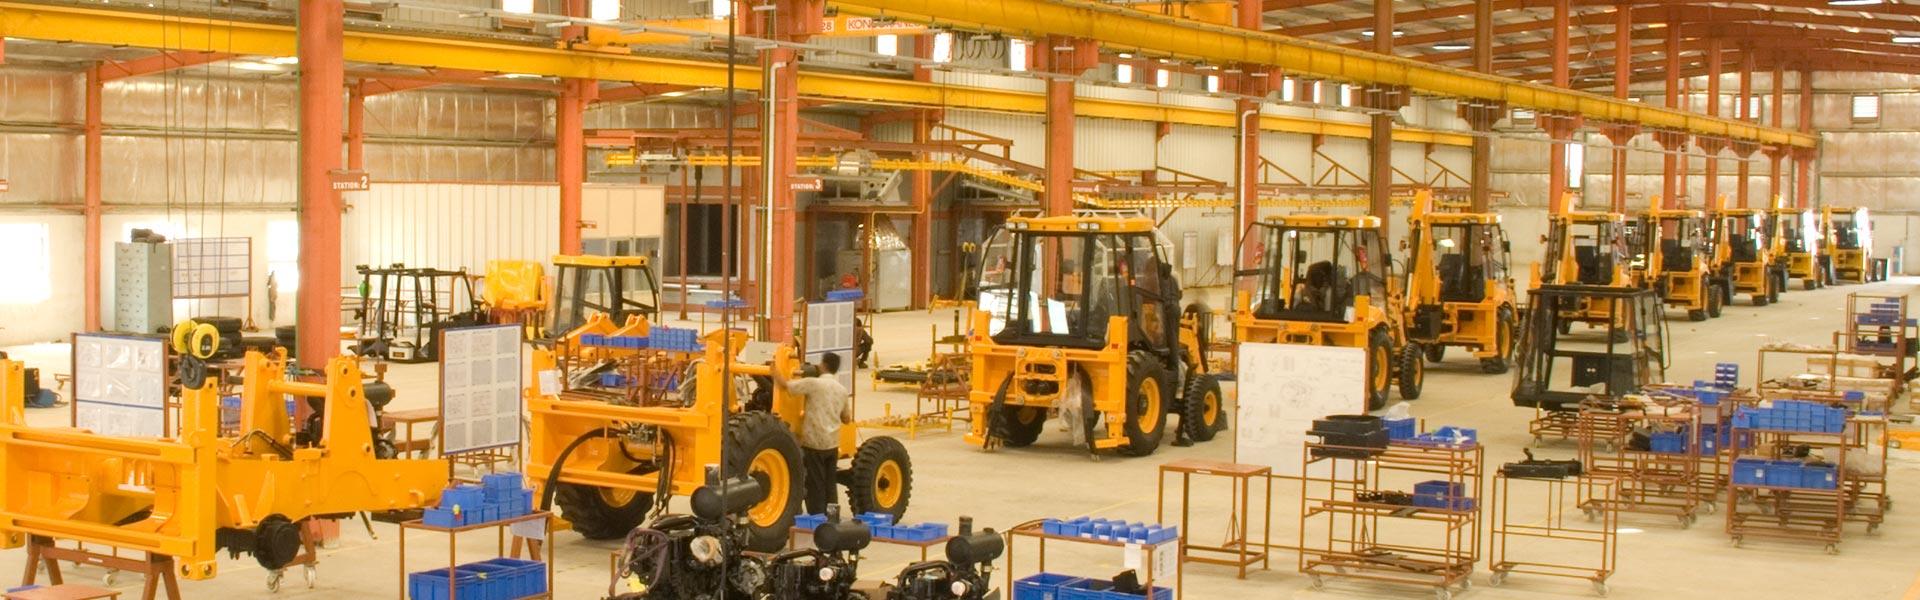 macchine operatrici bull About-slider-2